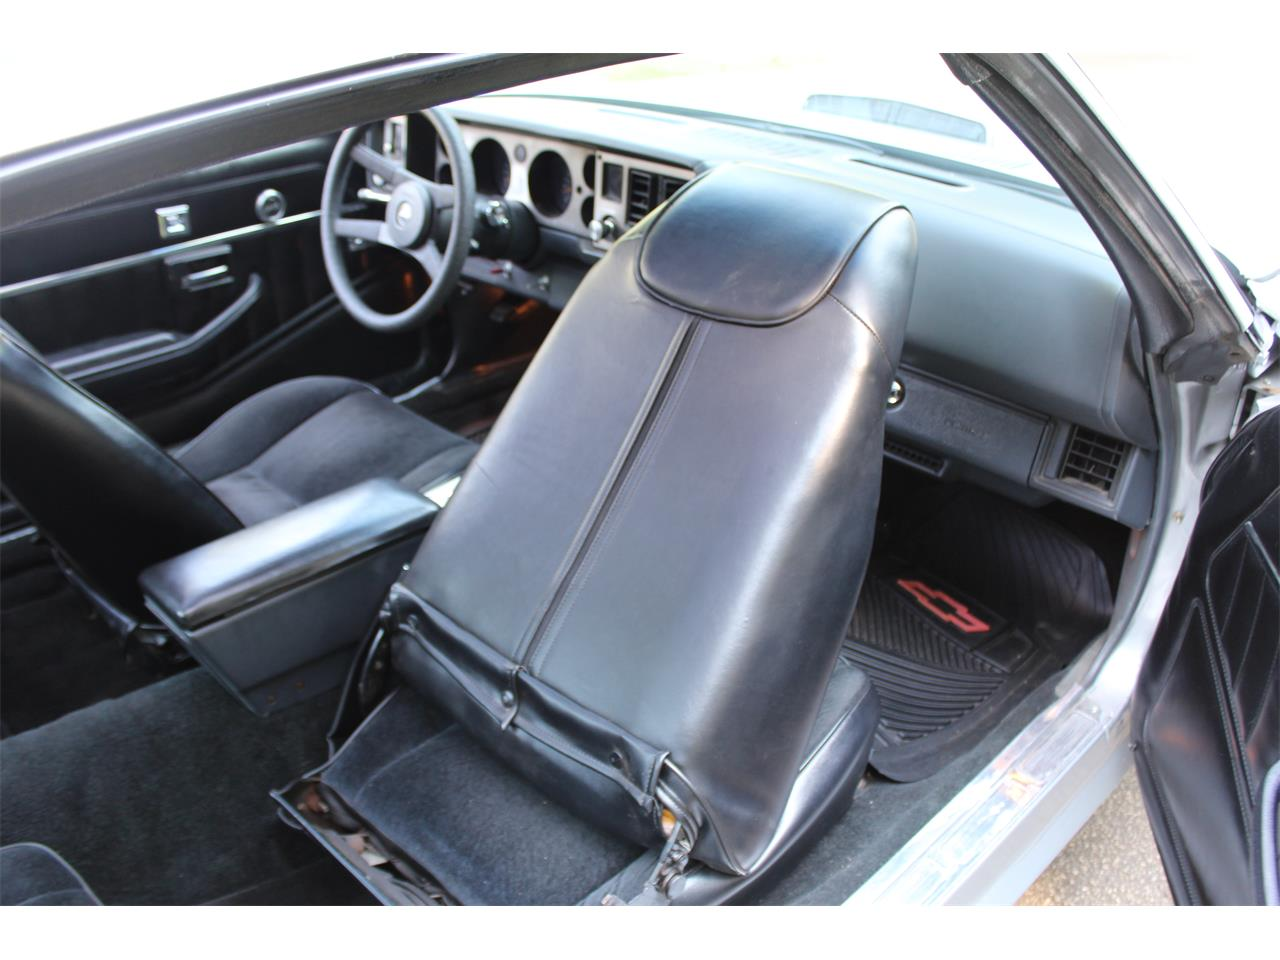 1981 Chevrolet Camaro Z28 (CC-1362022) for sale in Roswell, Georgia